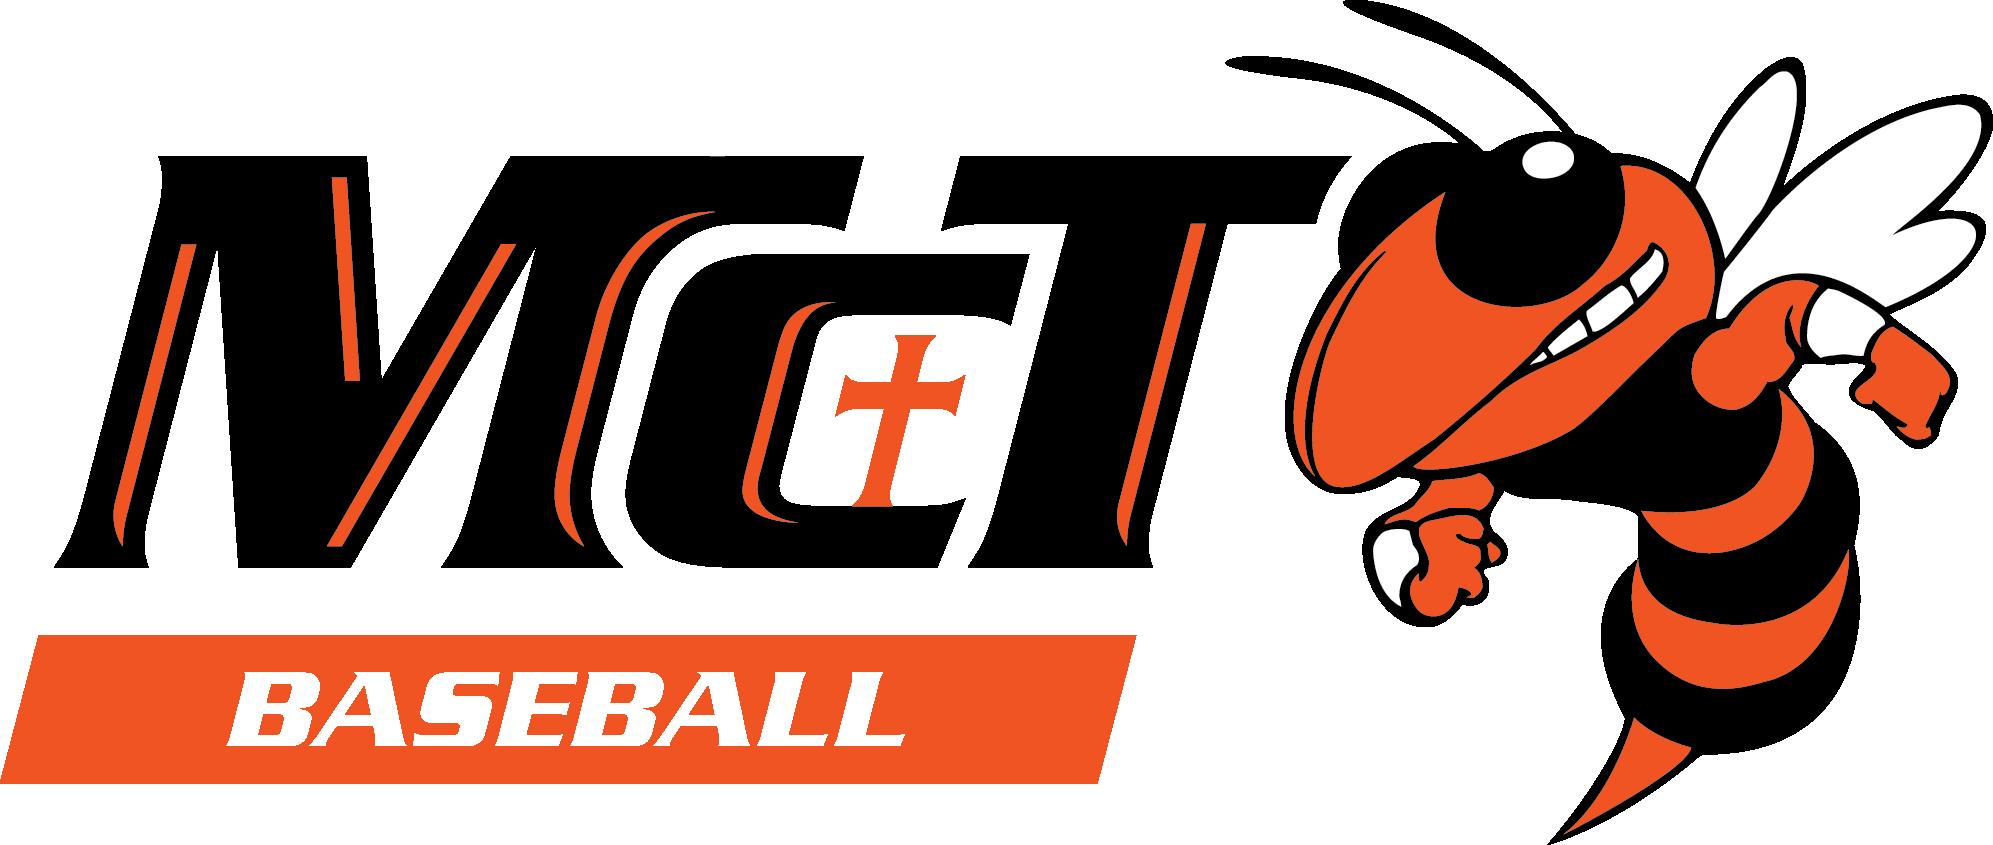 Varsity baseball 2017 clipart clipart download Baseball Home Page – Baseball – McGill-Toolen Catholic High School clipart download